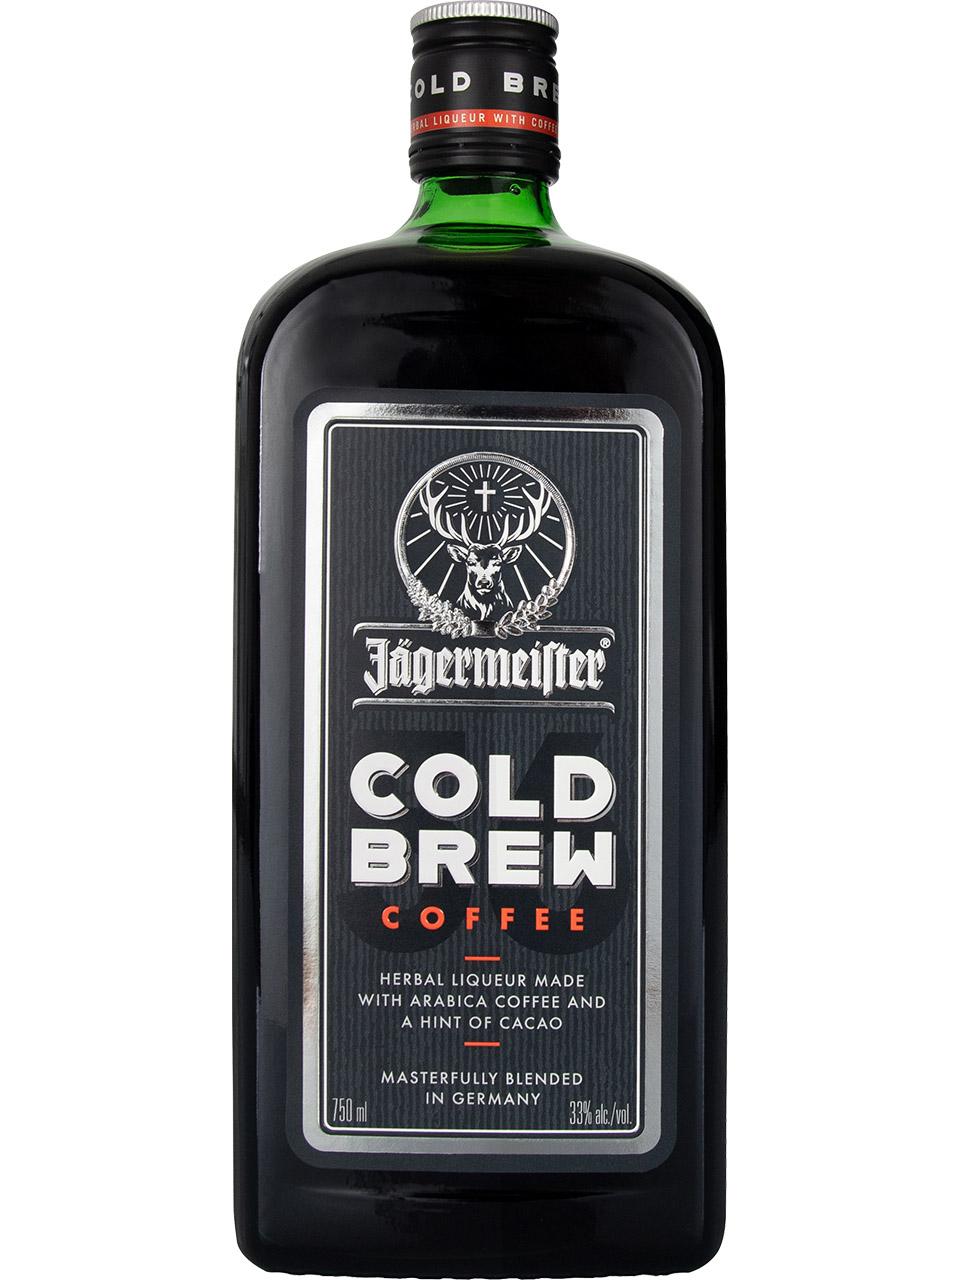 Jagermeister Cold Brew Liqueur